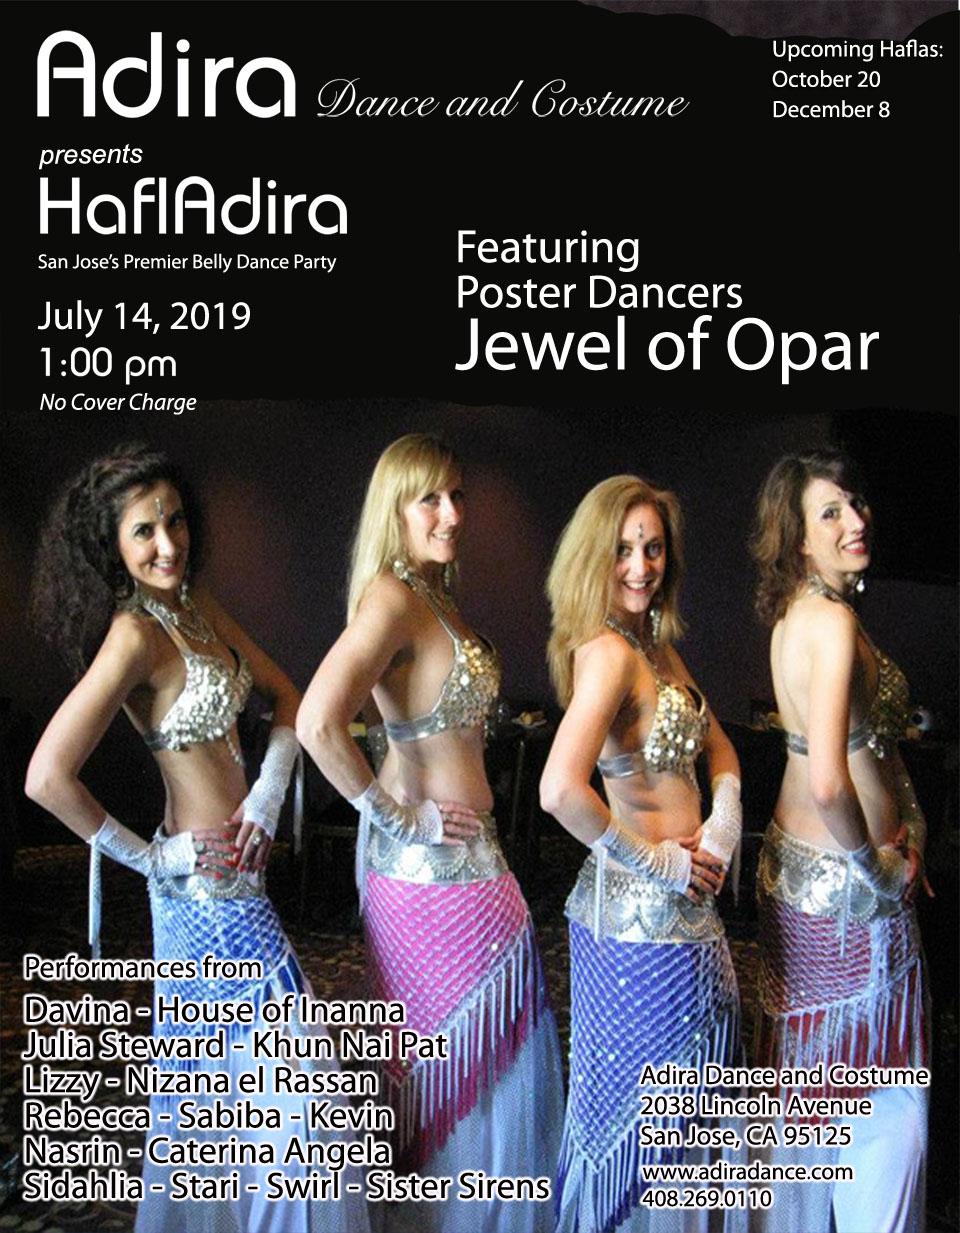 hafladira-flyer-july-2019-3-small.jpg